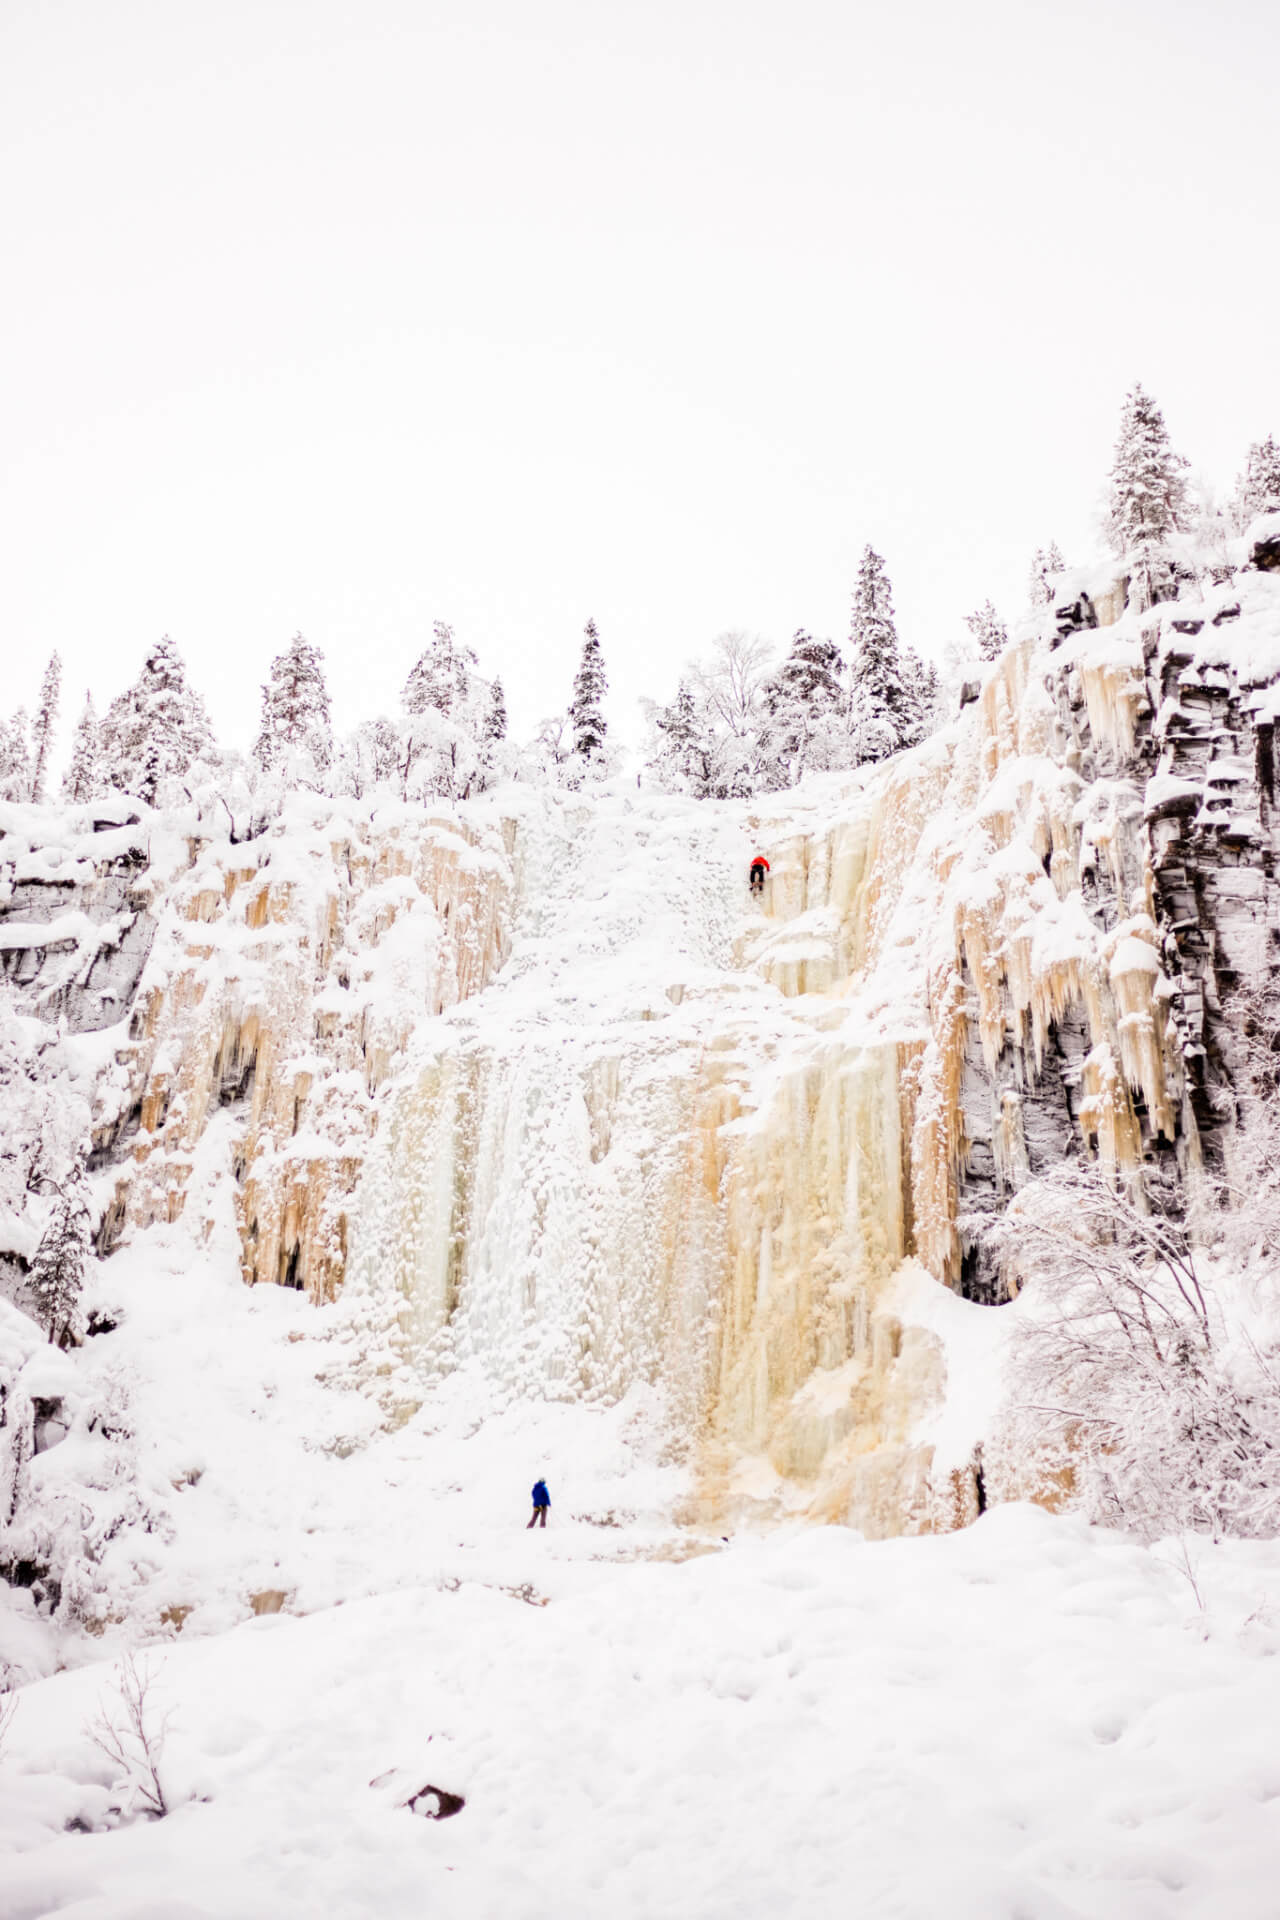 yuichi yokota finland winter 6